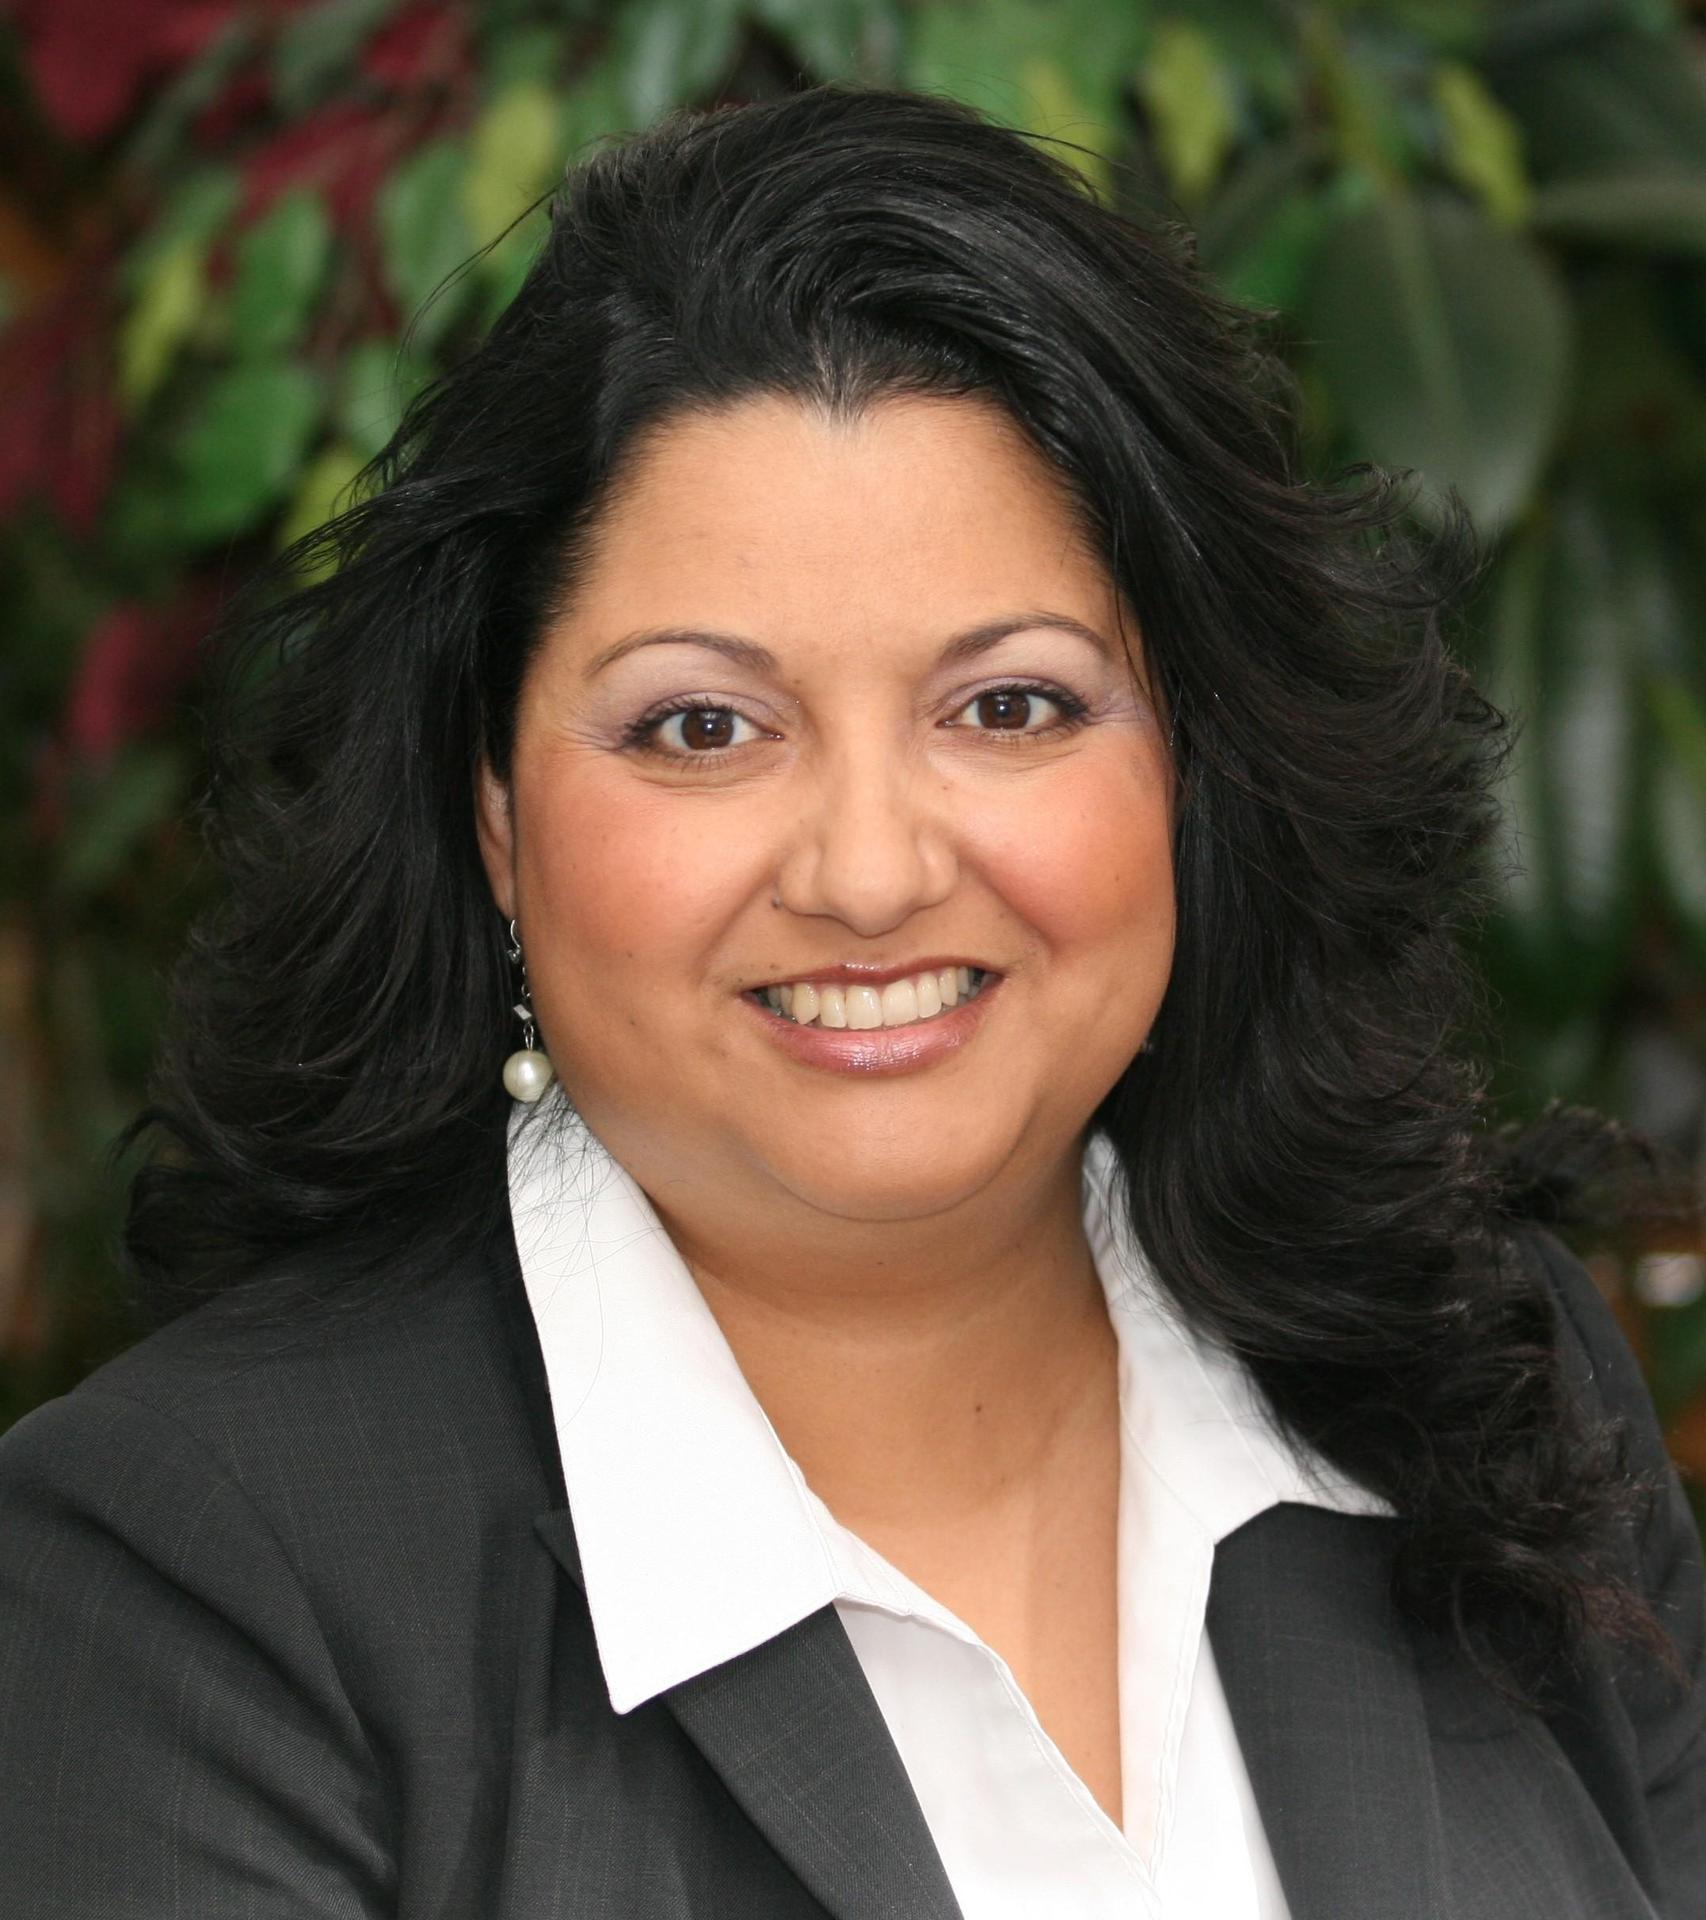 Susana Rios